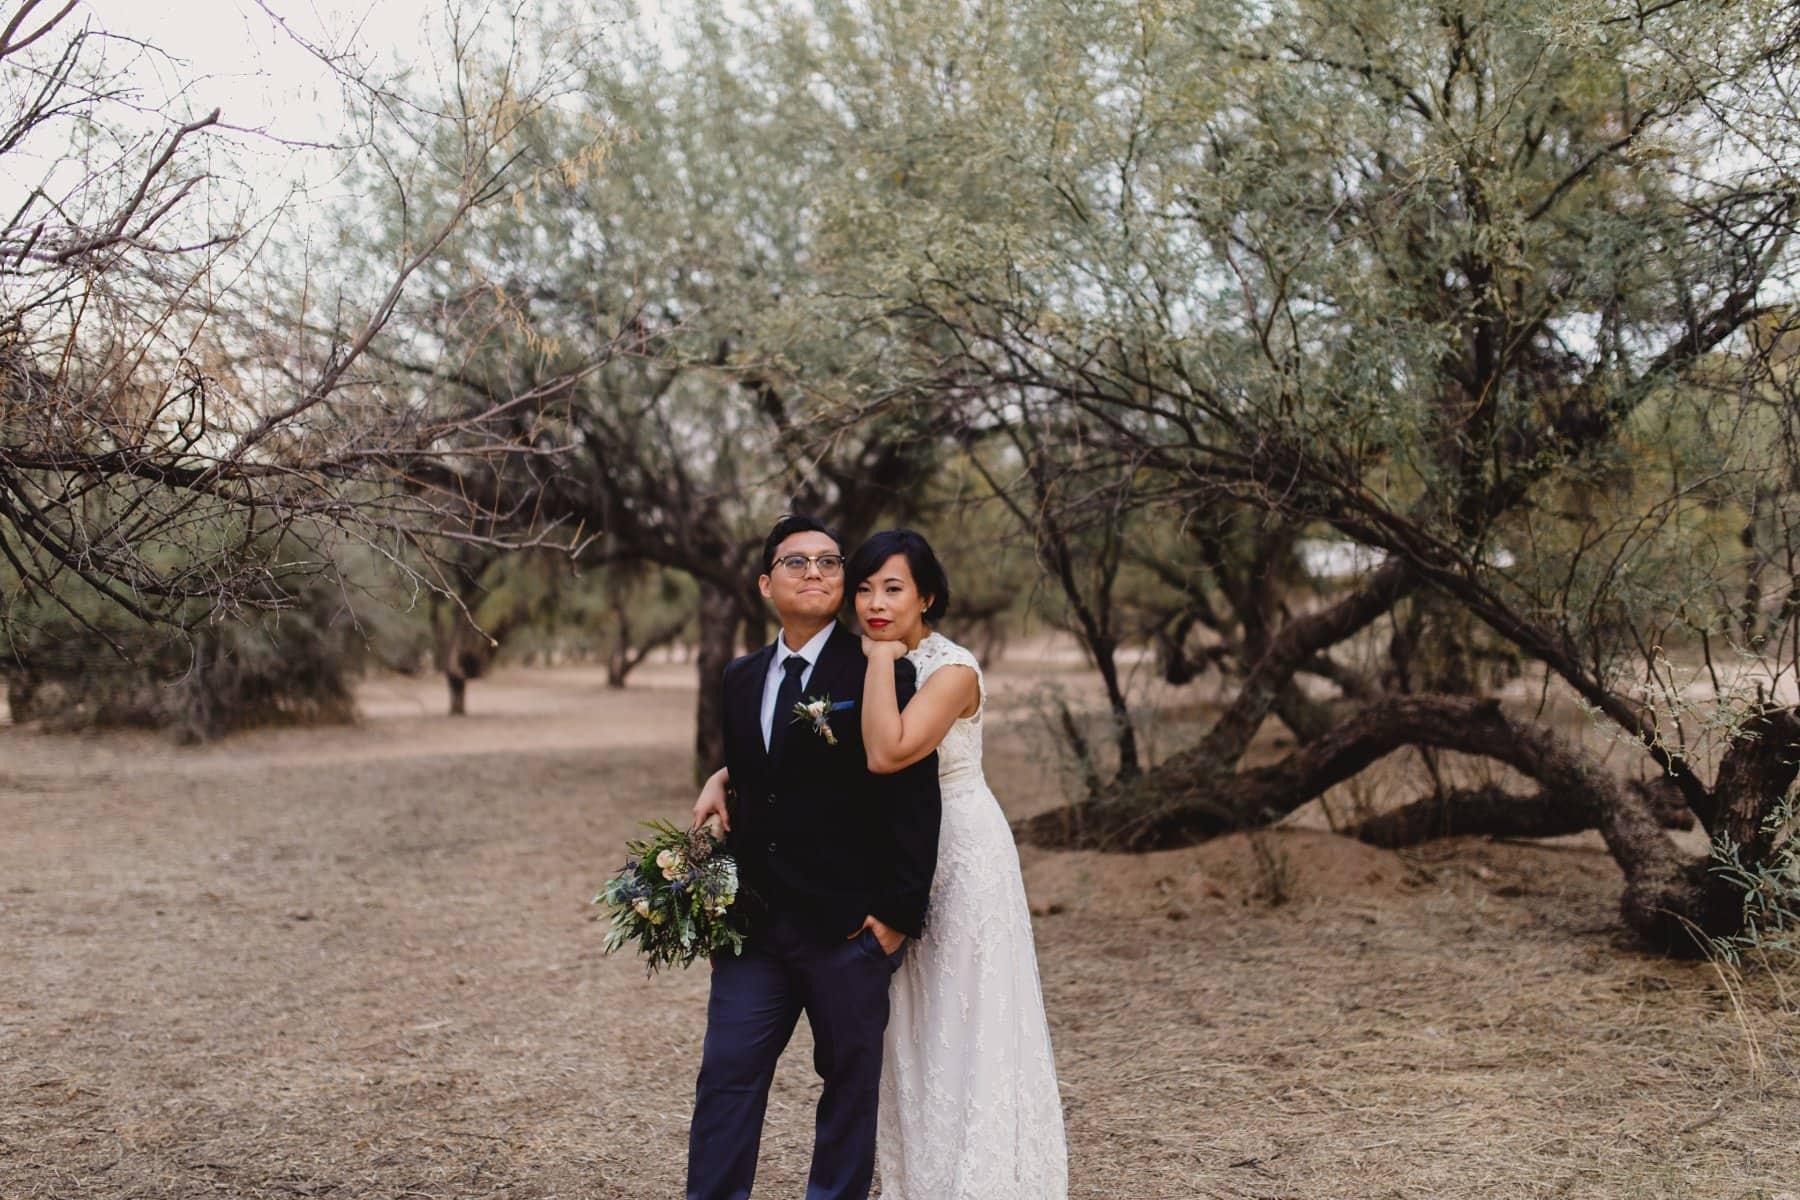 bride & groom photos at Salt River wedding